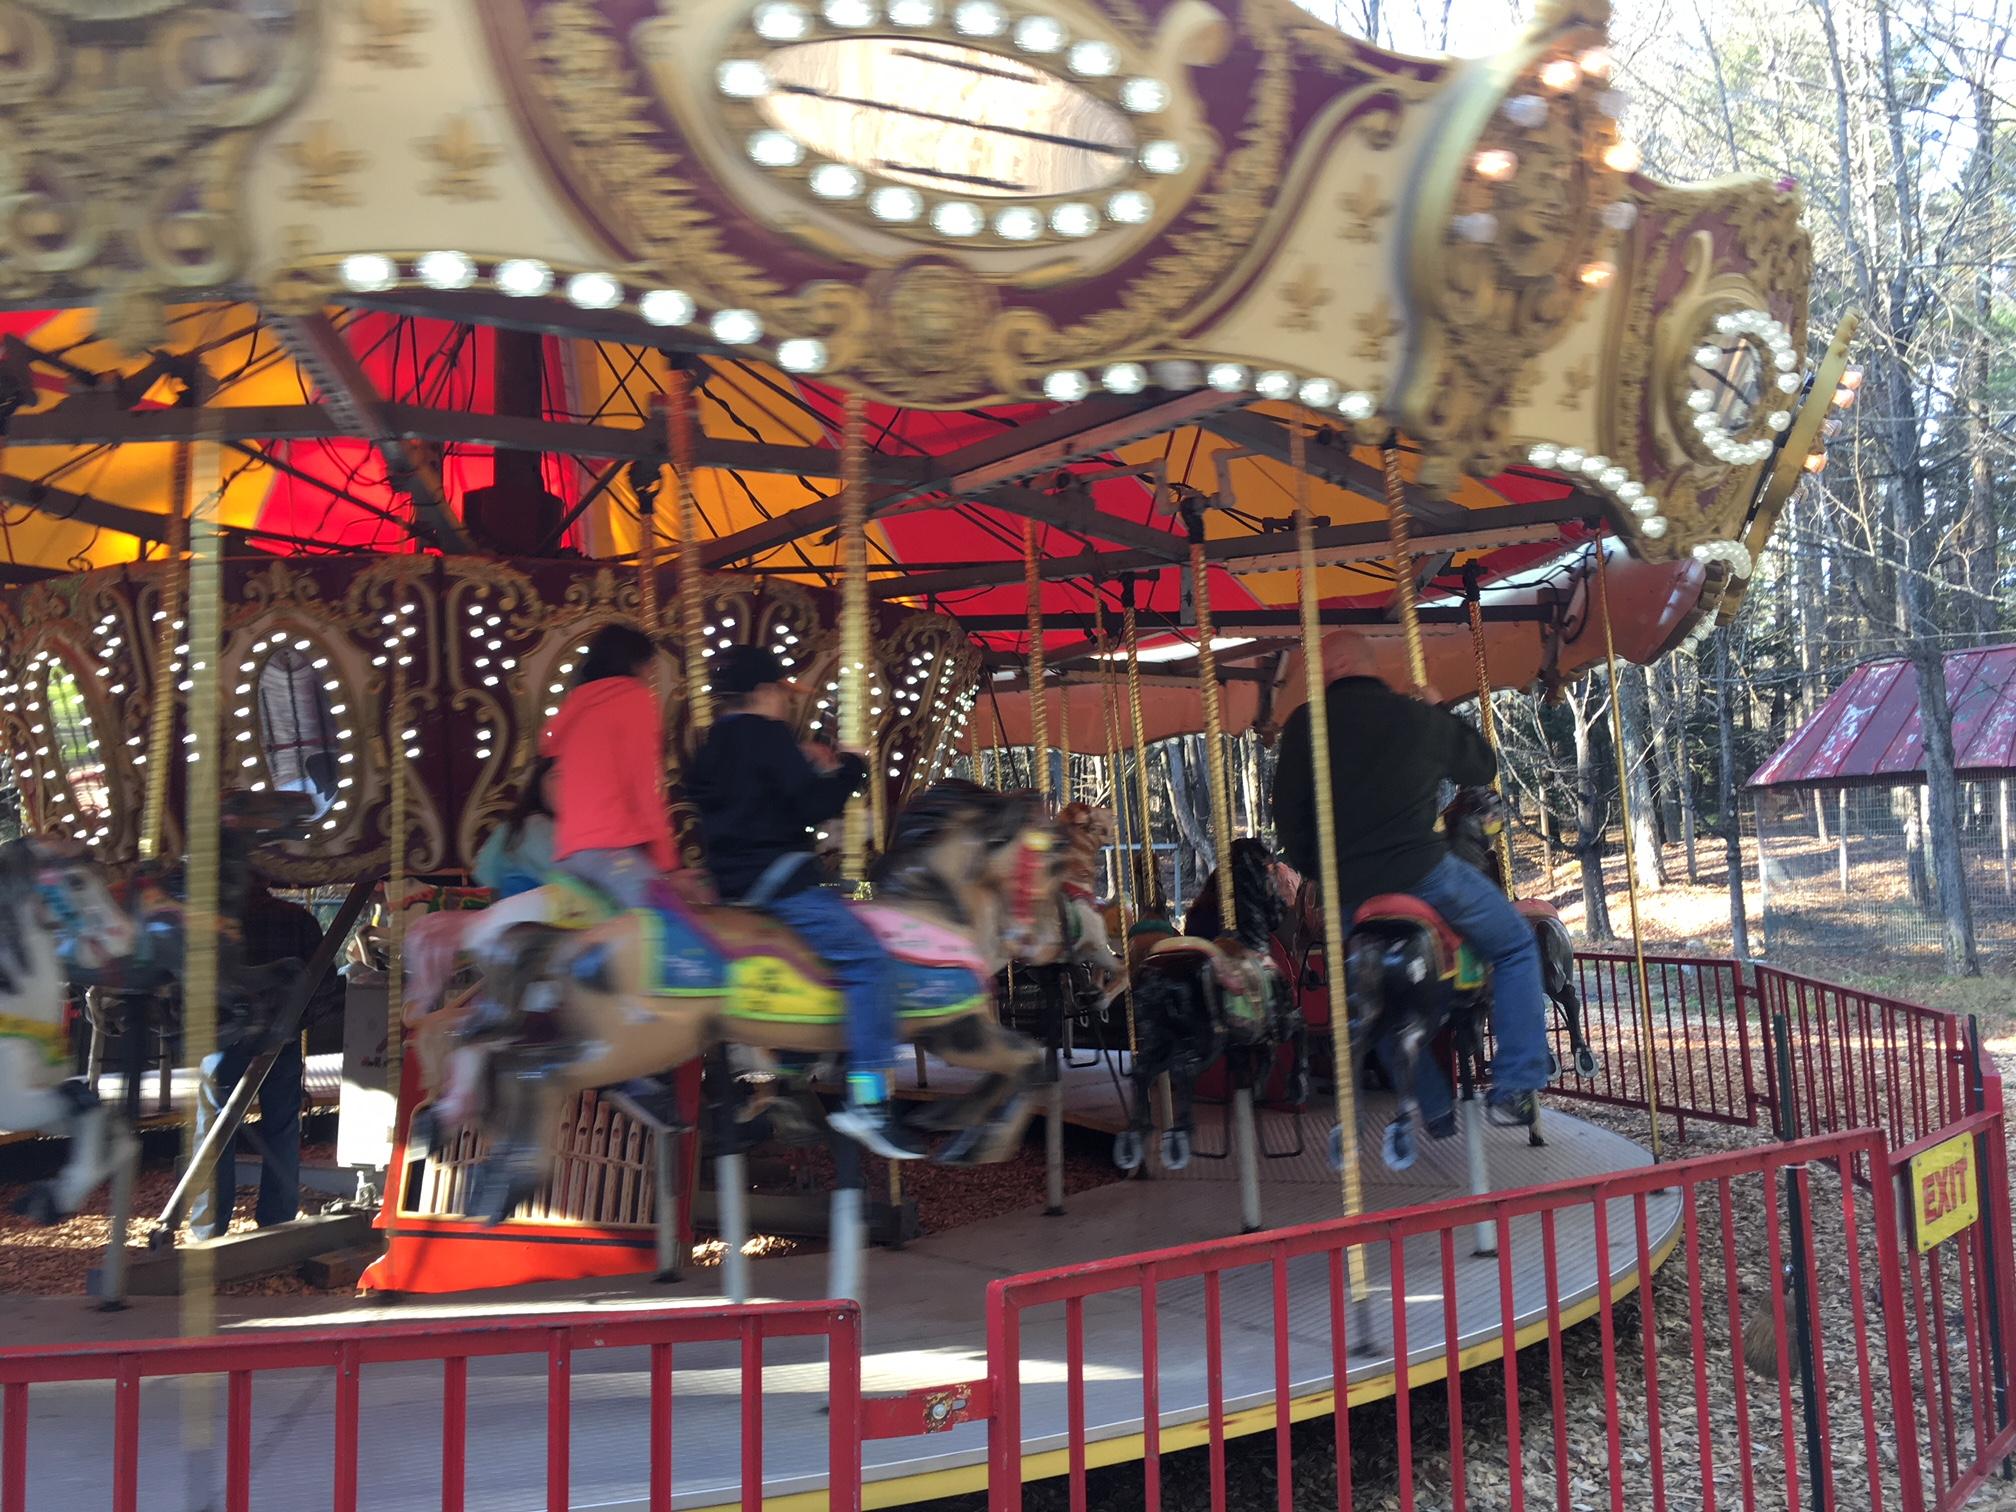 Santa's Land Carousel